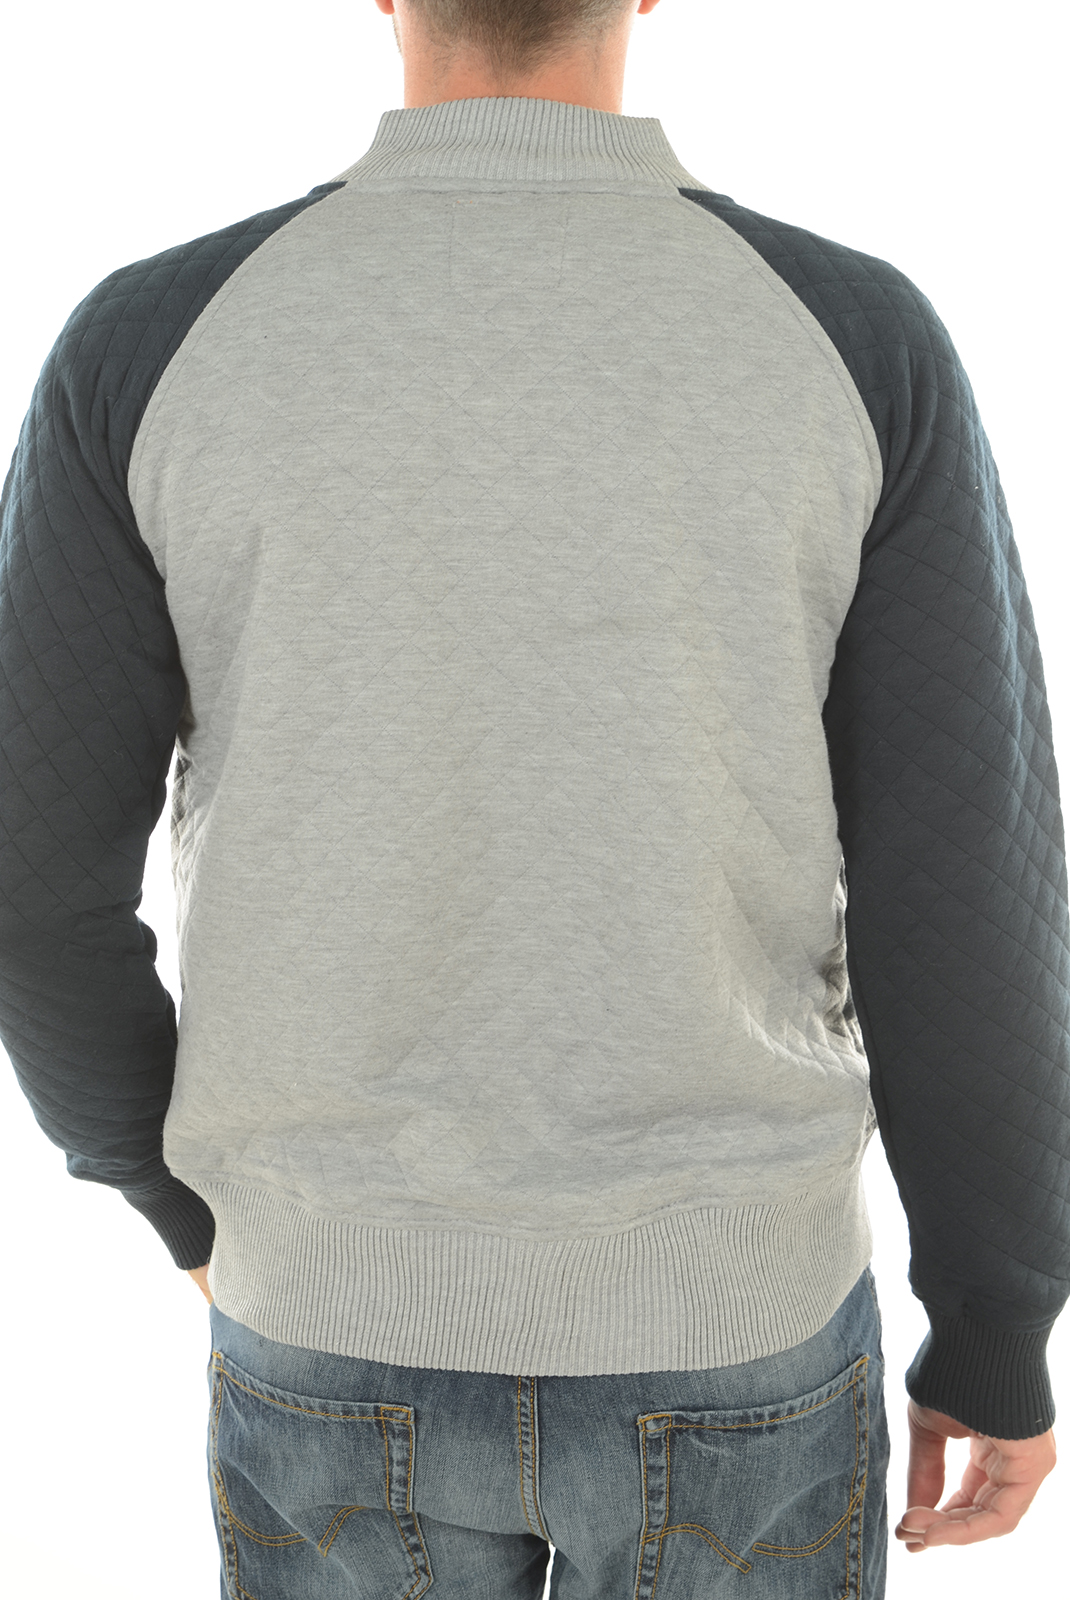 Pulls & Gilets  Biaggio jeans SKOUBAS GRIS CLAIR